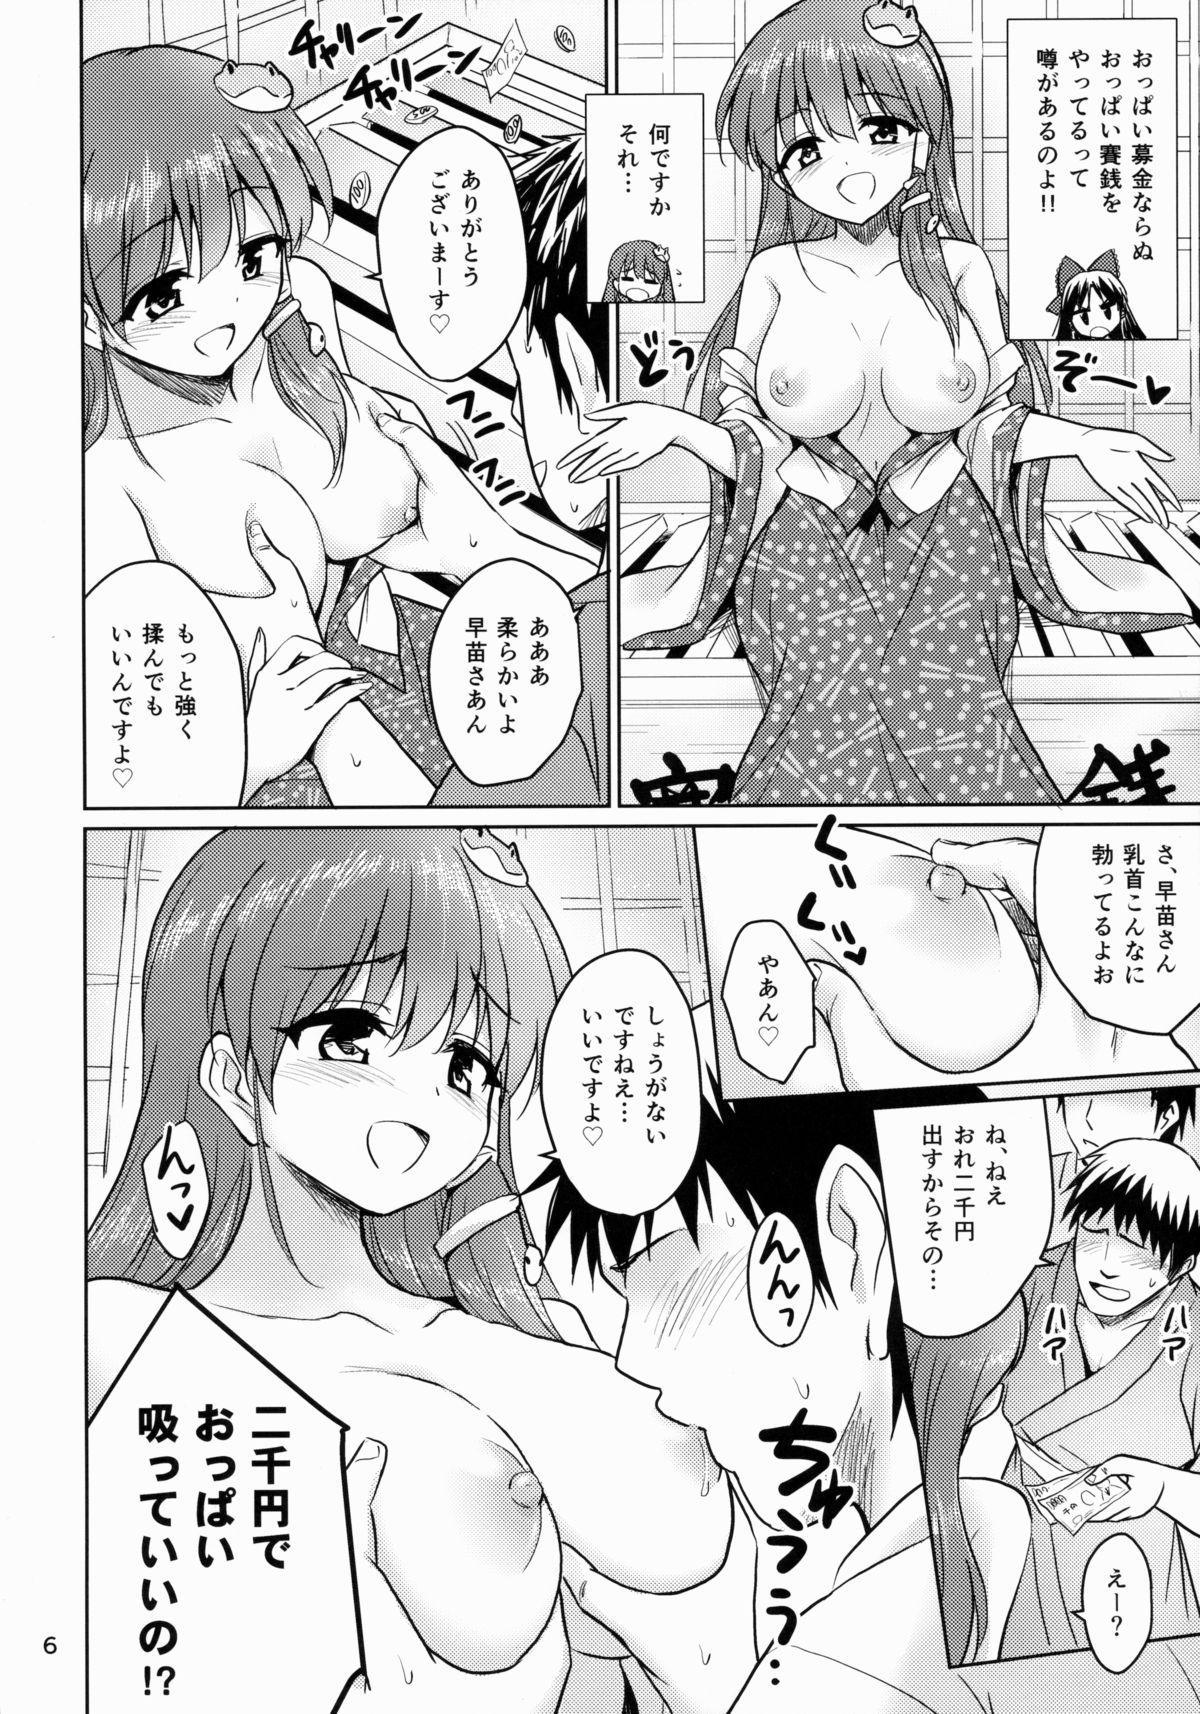 Ochinpo Daisuki Sana Bitch Shishou 4